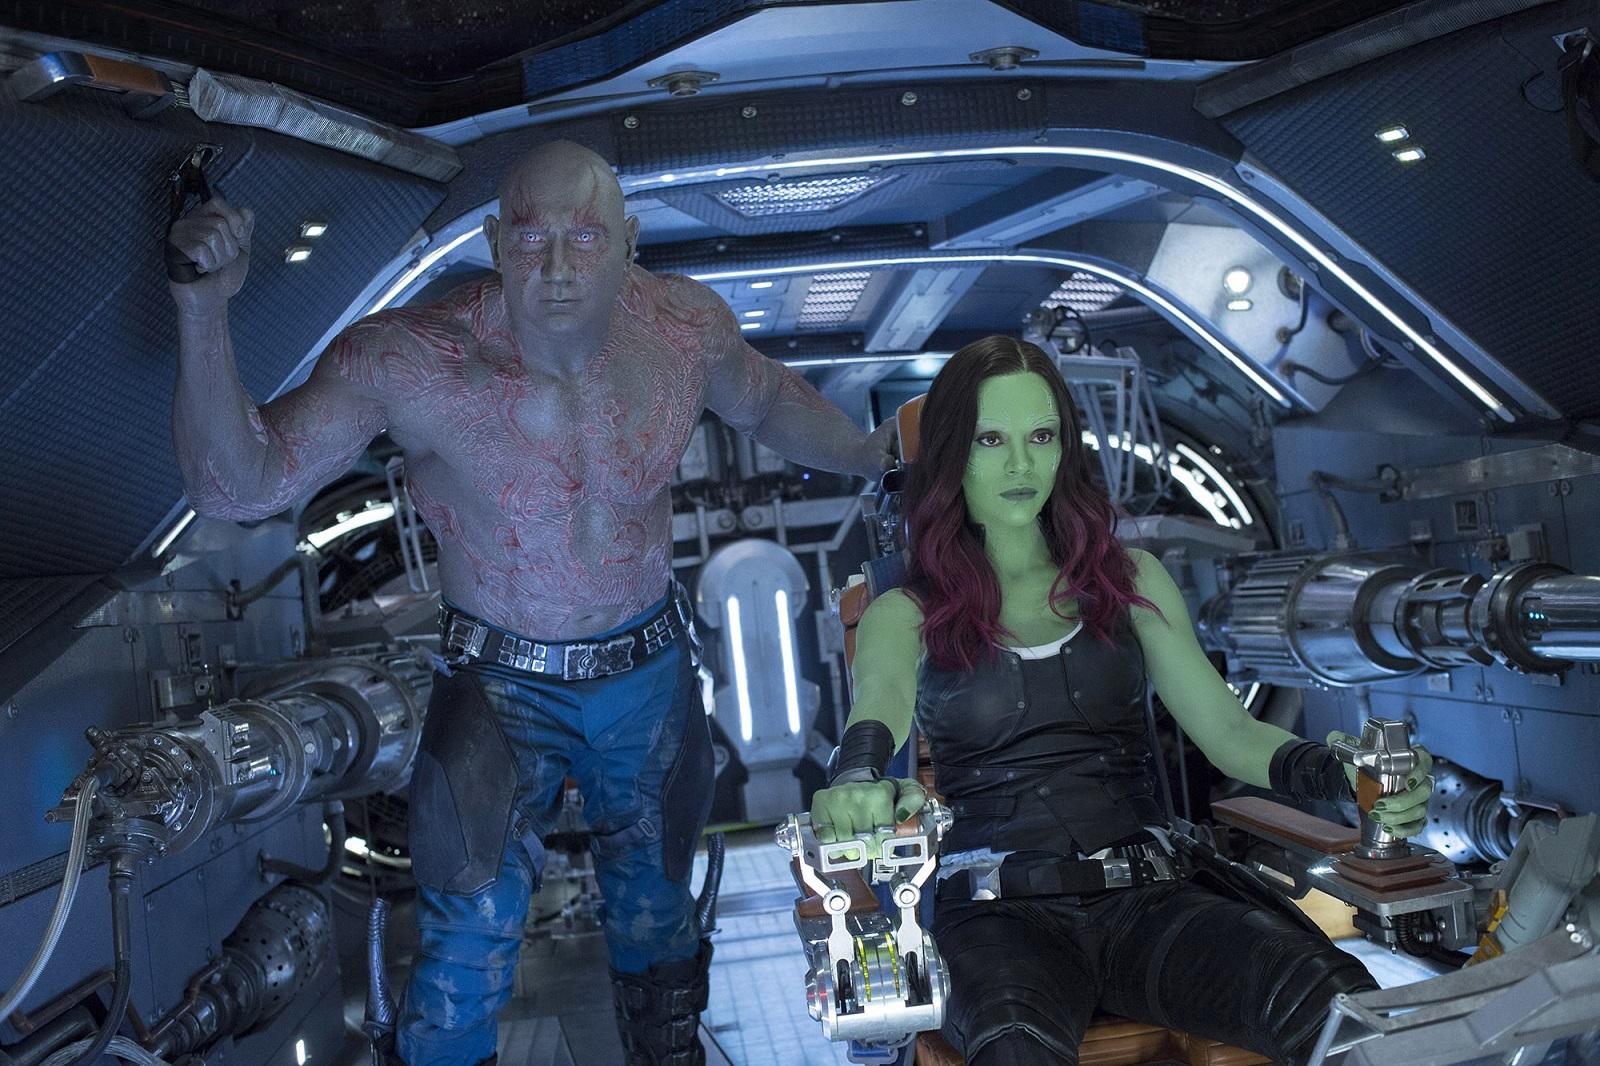 Drax (Dave Bautista) and Gamora (Zoe Saldana) in 'Guardians Of The Galaxy Vol. 2.' (Chuck Zlotnick, Marvel Studios)